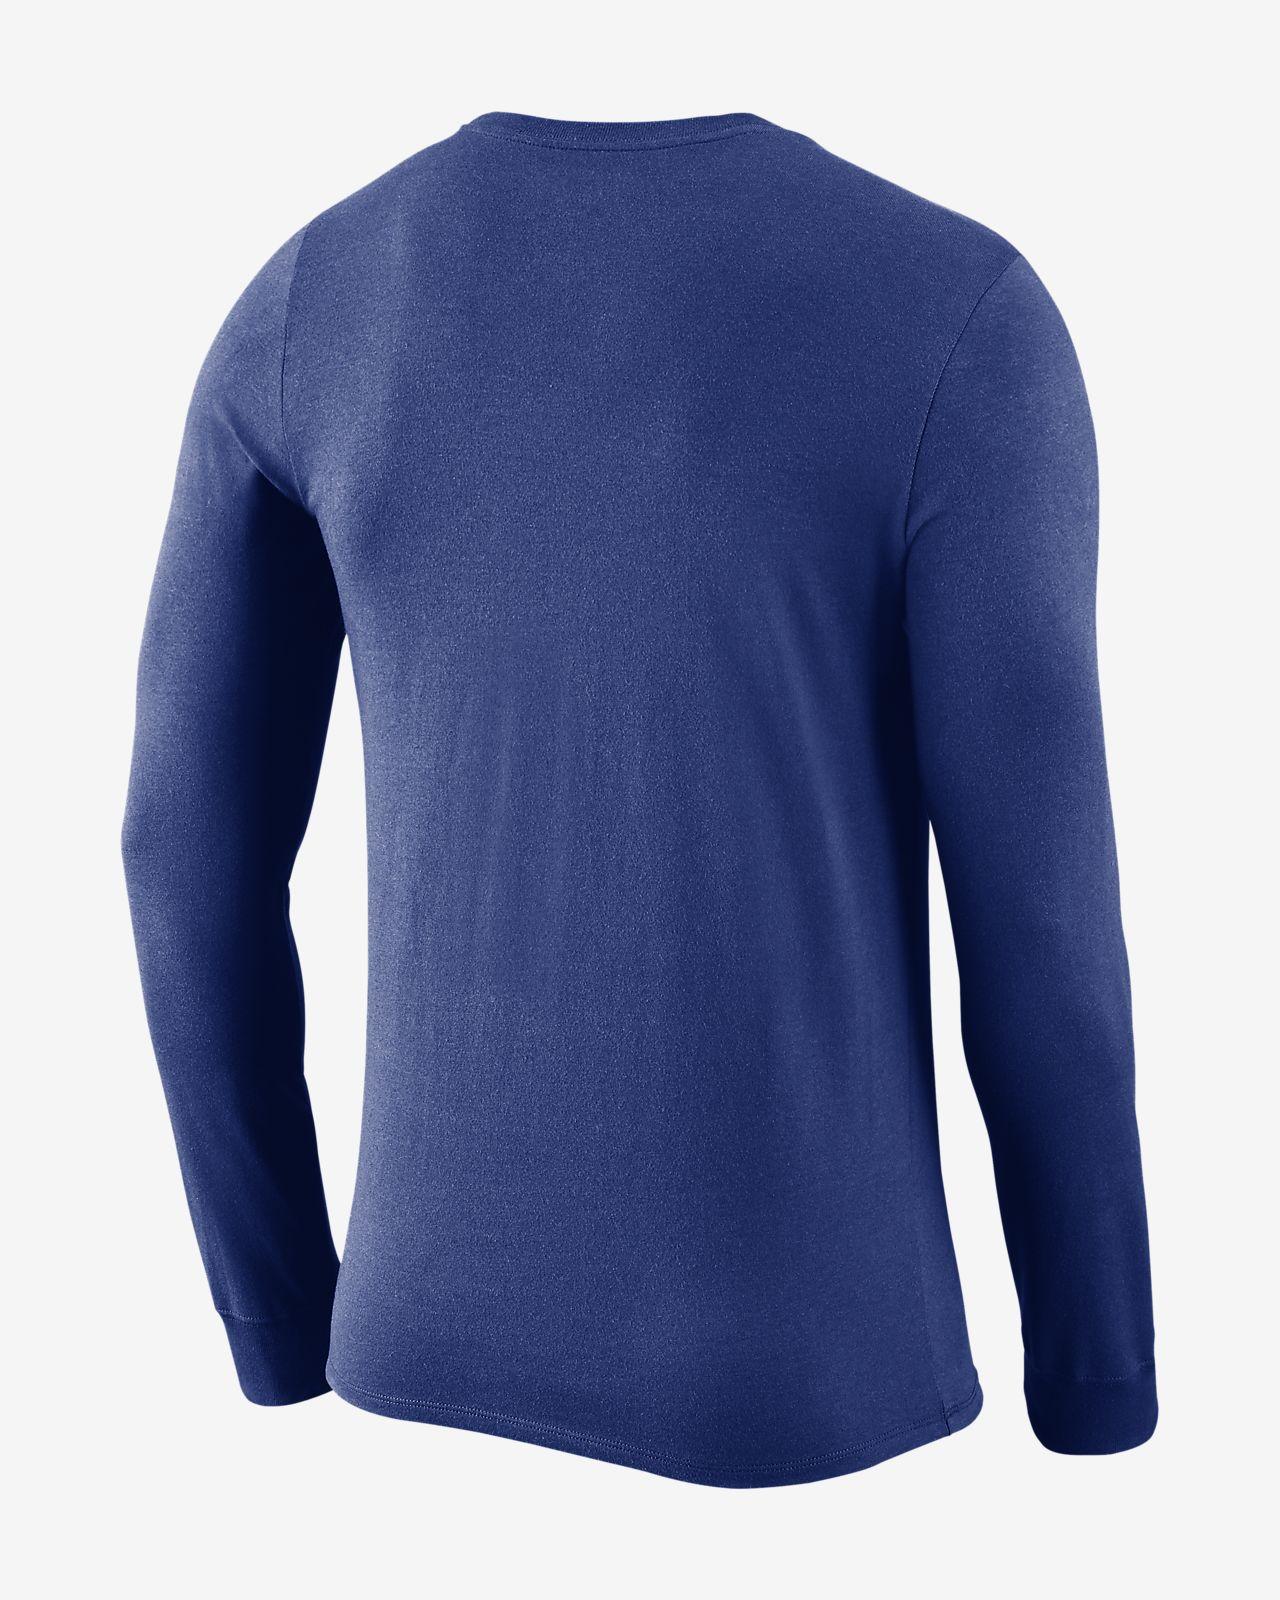 a945a05e Nike Dri-FIT Seismic (NFL Giants) Men's Long-Sleeve T-Shirt. Nike.com